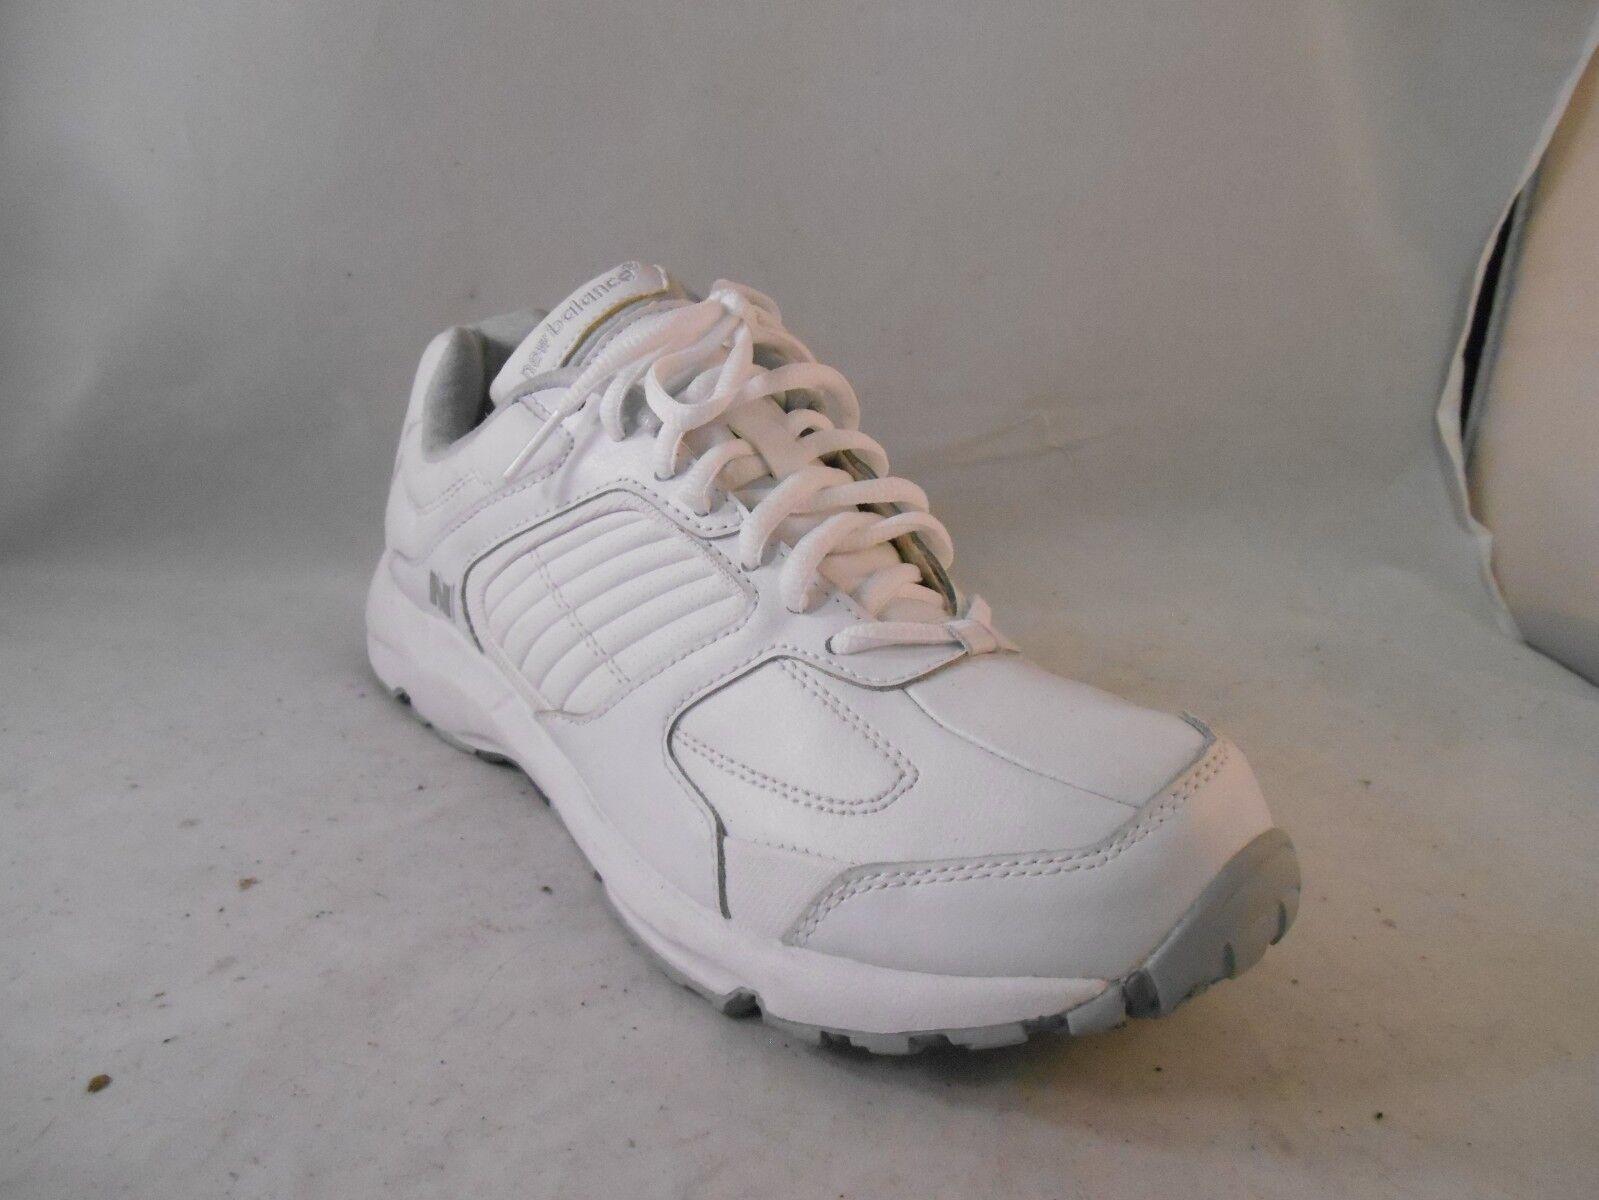 New Balance 475 White Leather Walking shoes Women's Size 11 M   43 EU